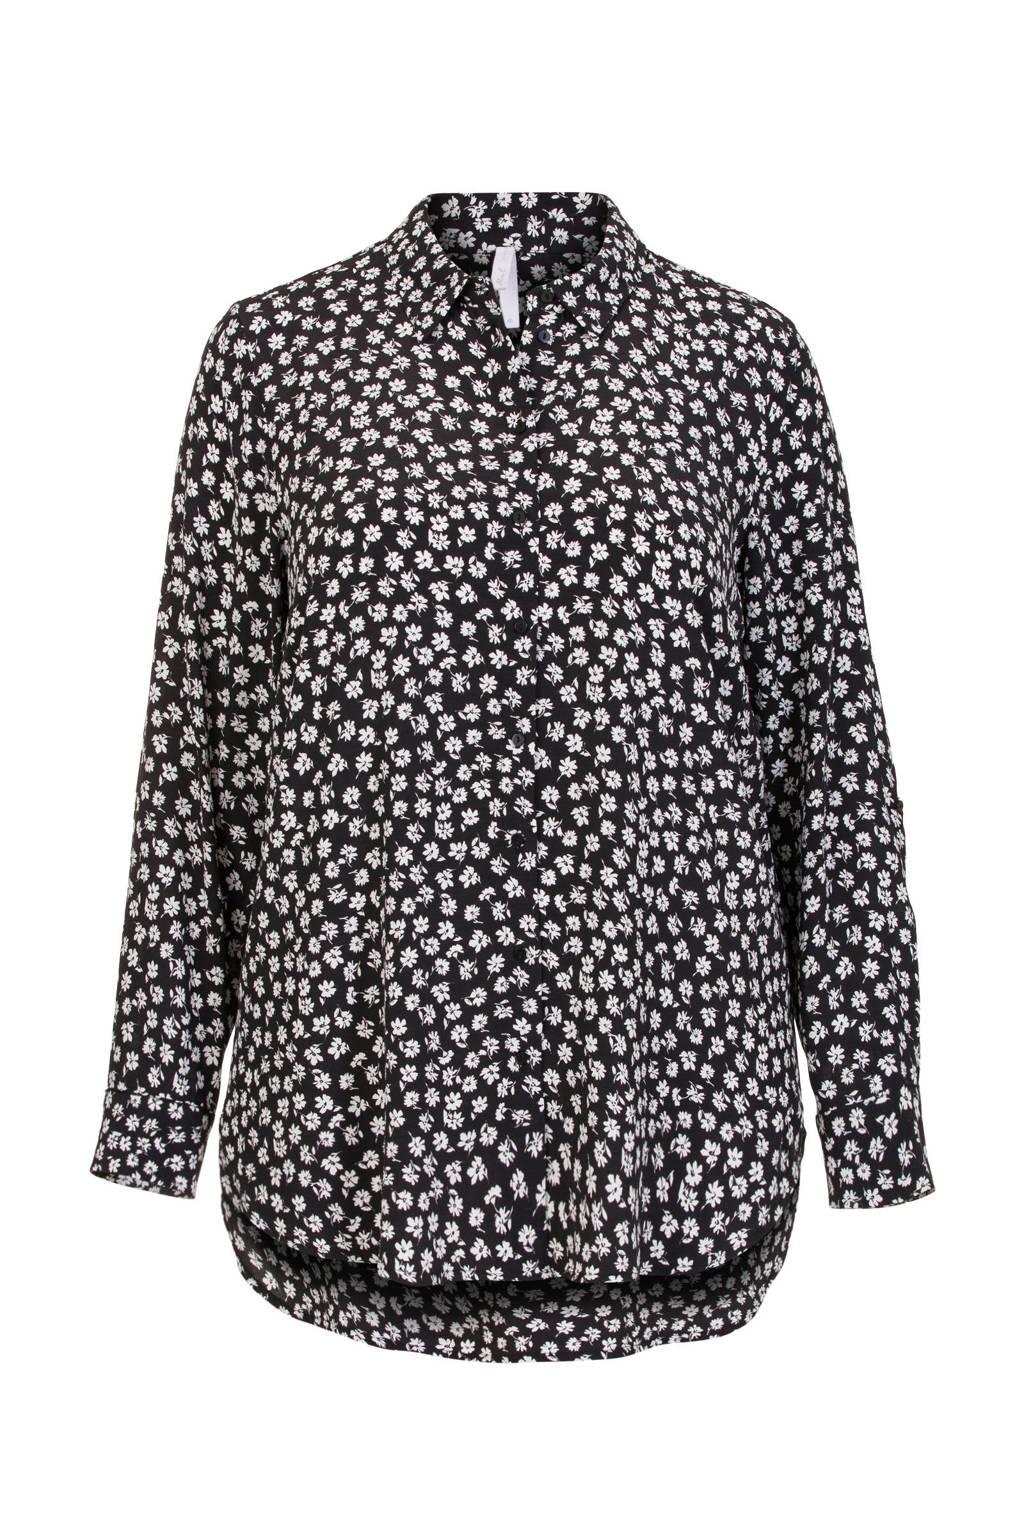 Miss Etam Plus blouse met all over print zwart, Zwart